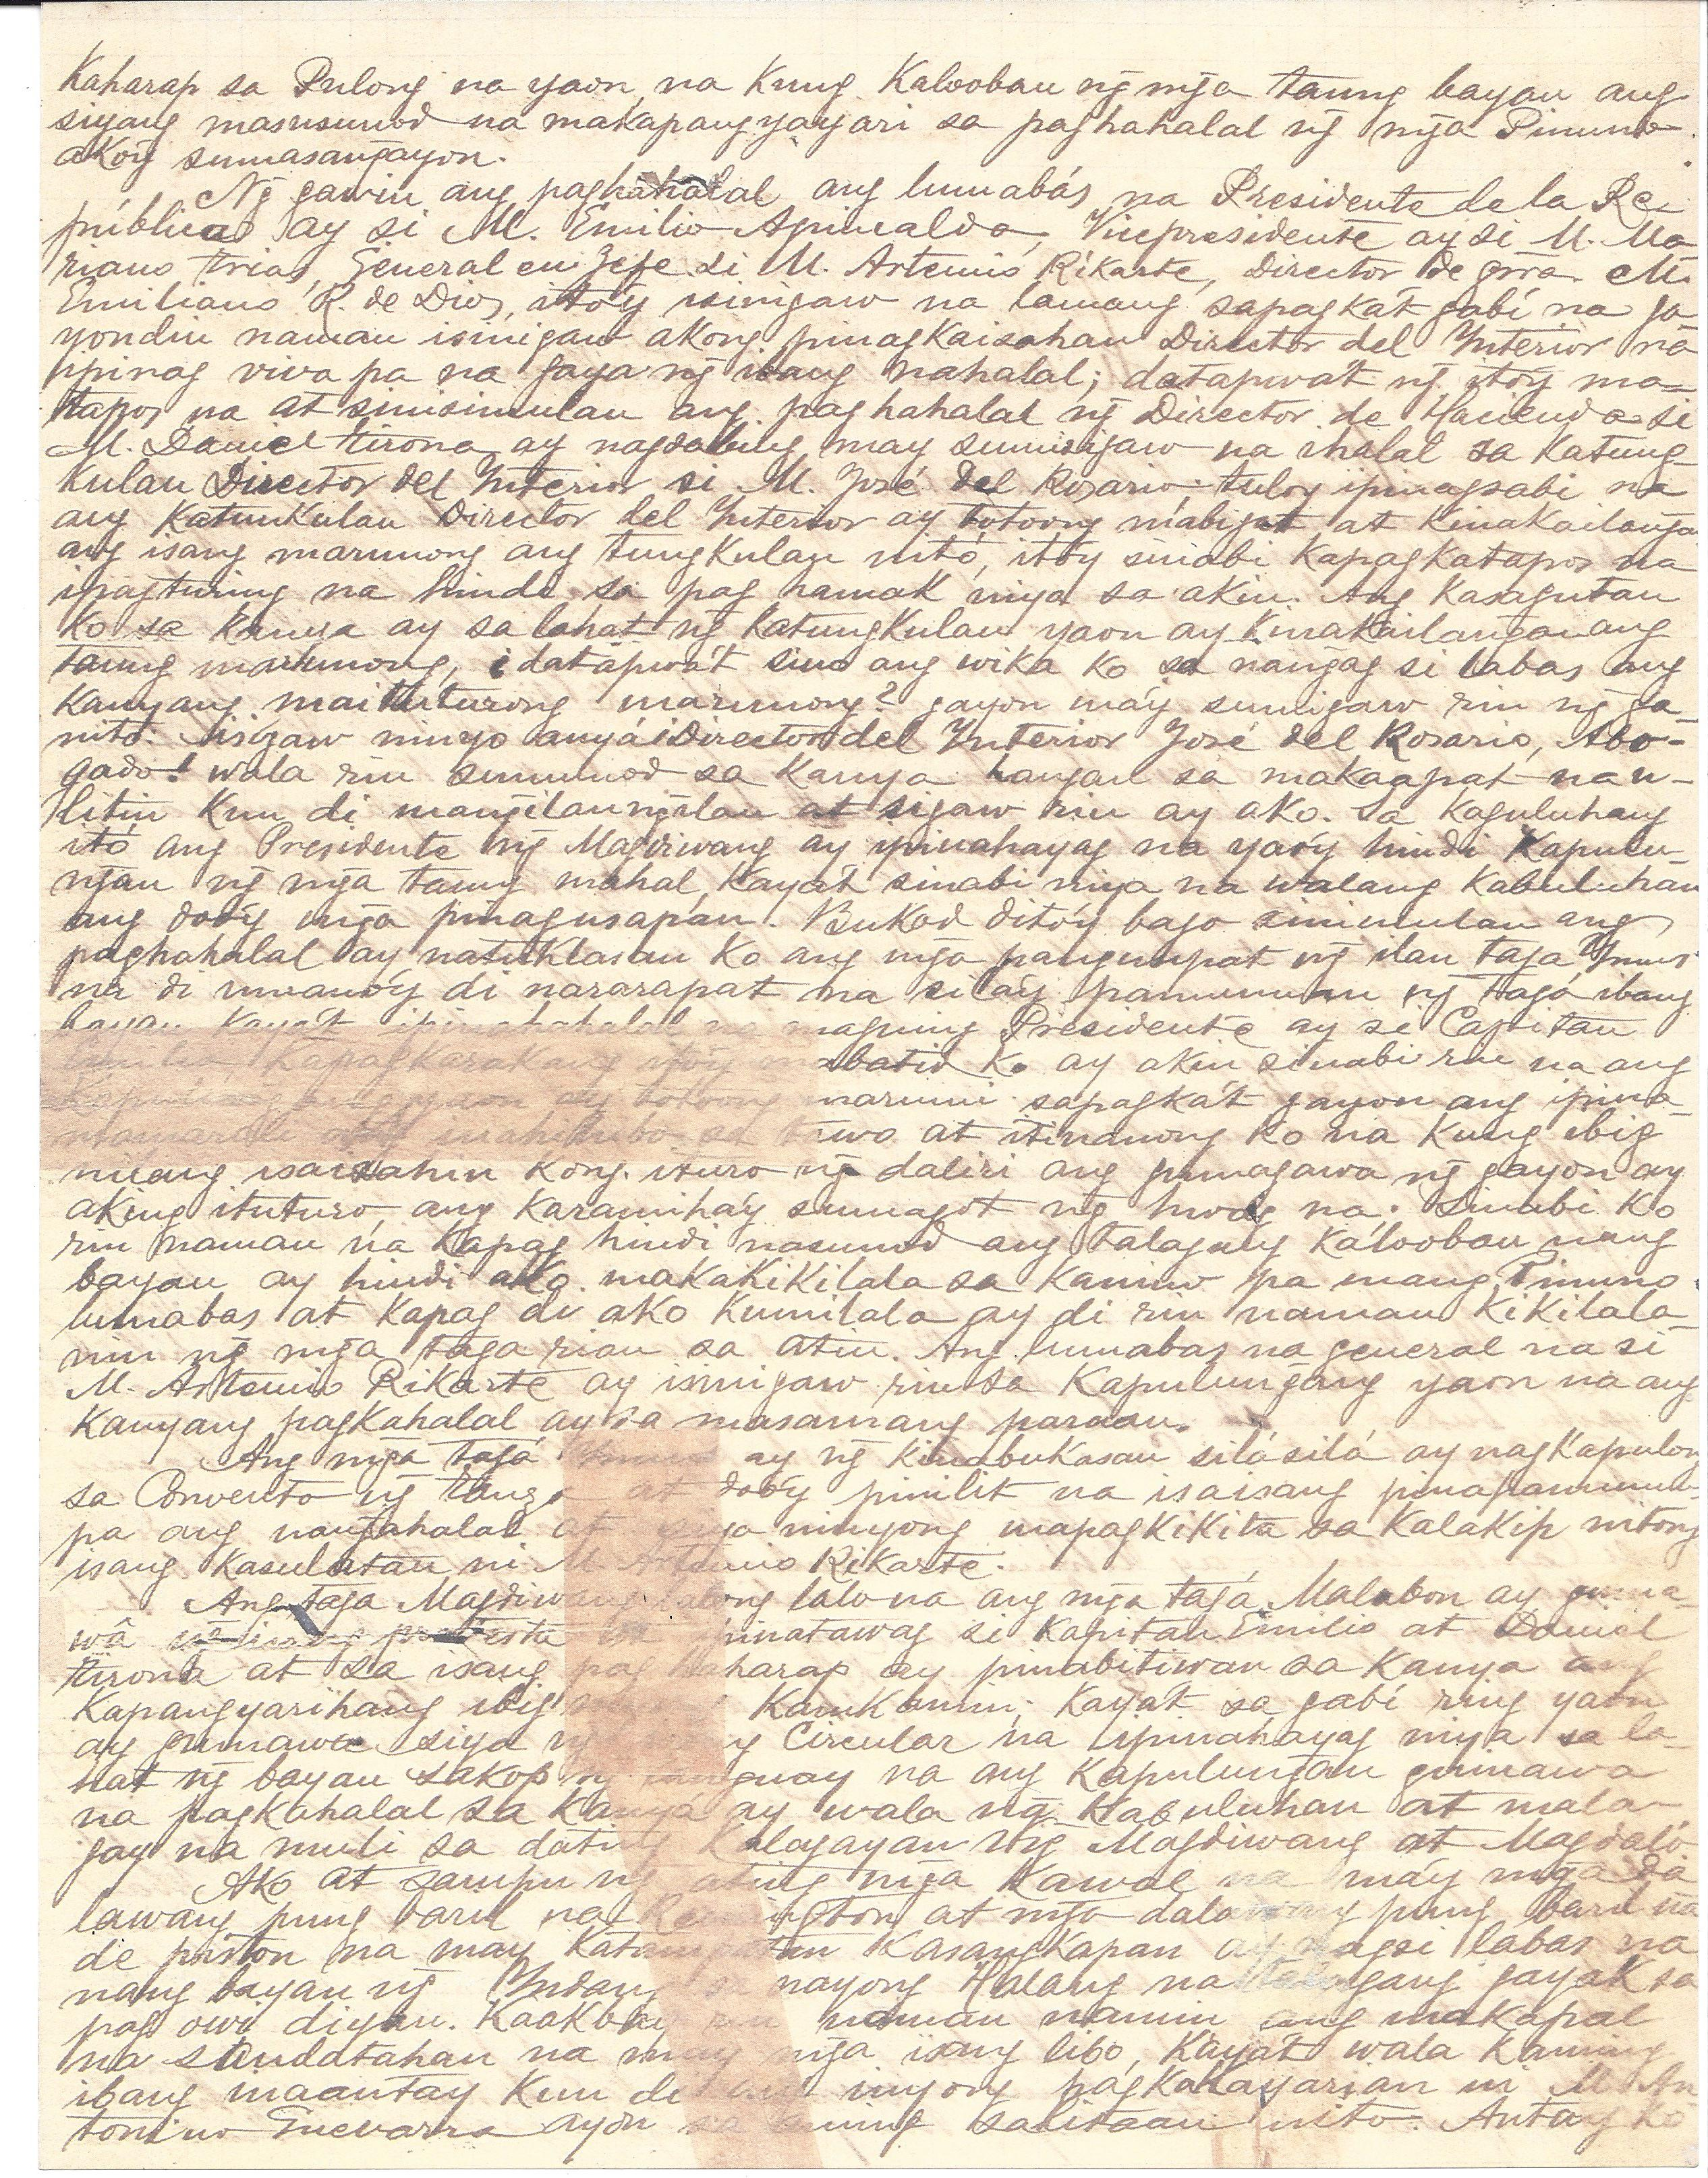 1897-04-24 Bonifacio to Jacinto page 2